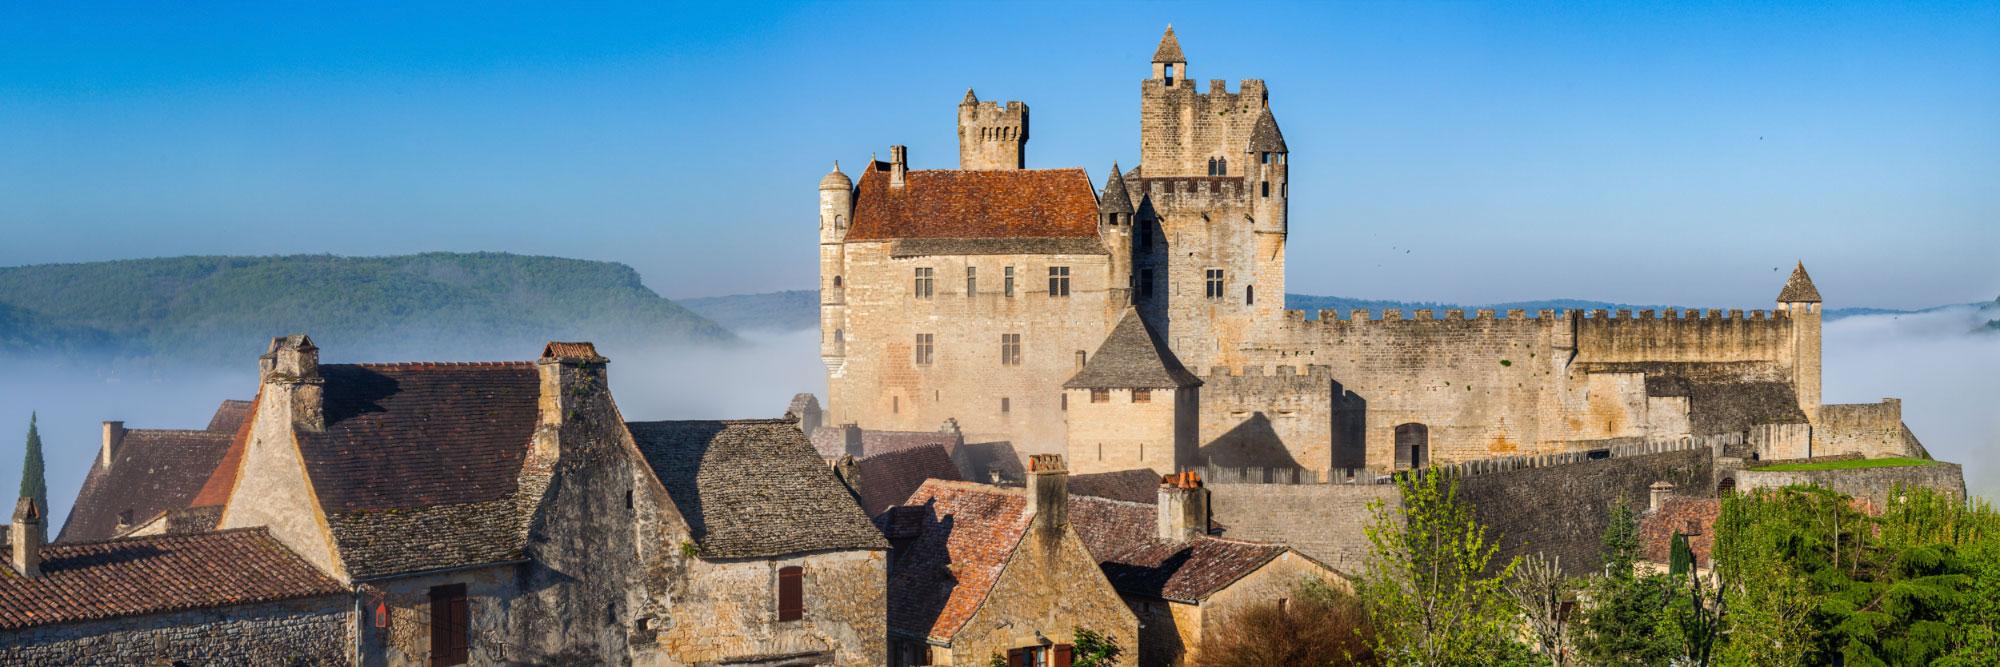 Château de Beynac, vallée de la Dordogne